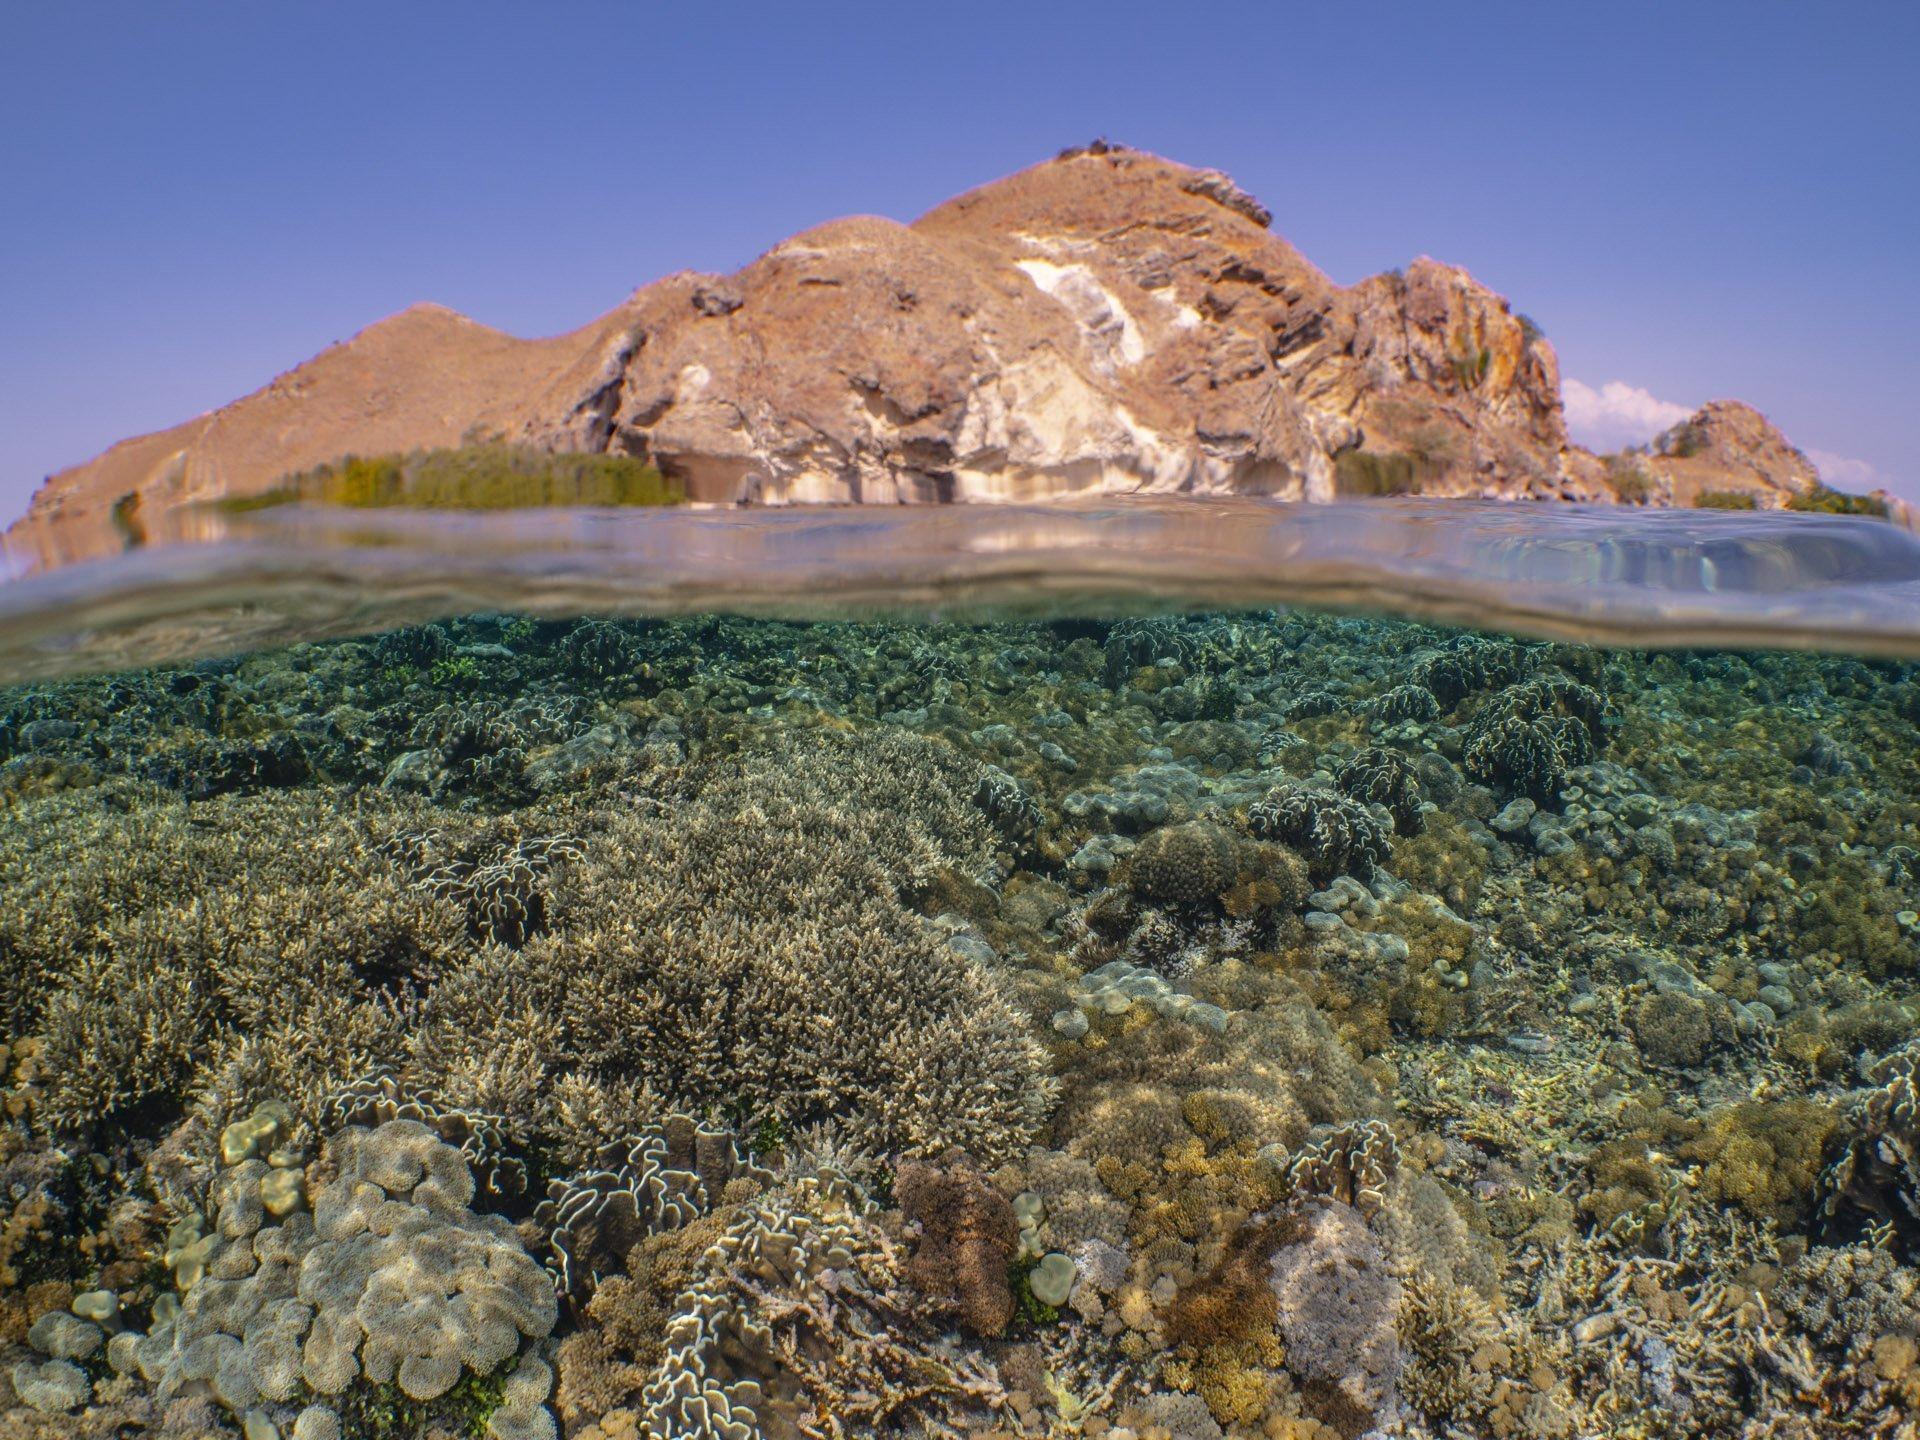 Split shot of Komodo reef and Komodo island